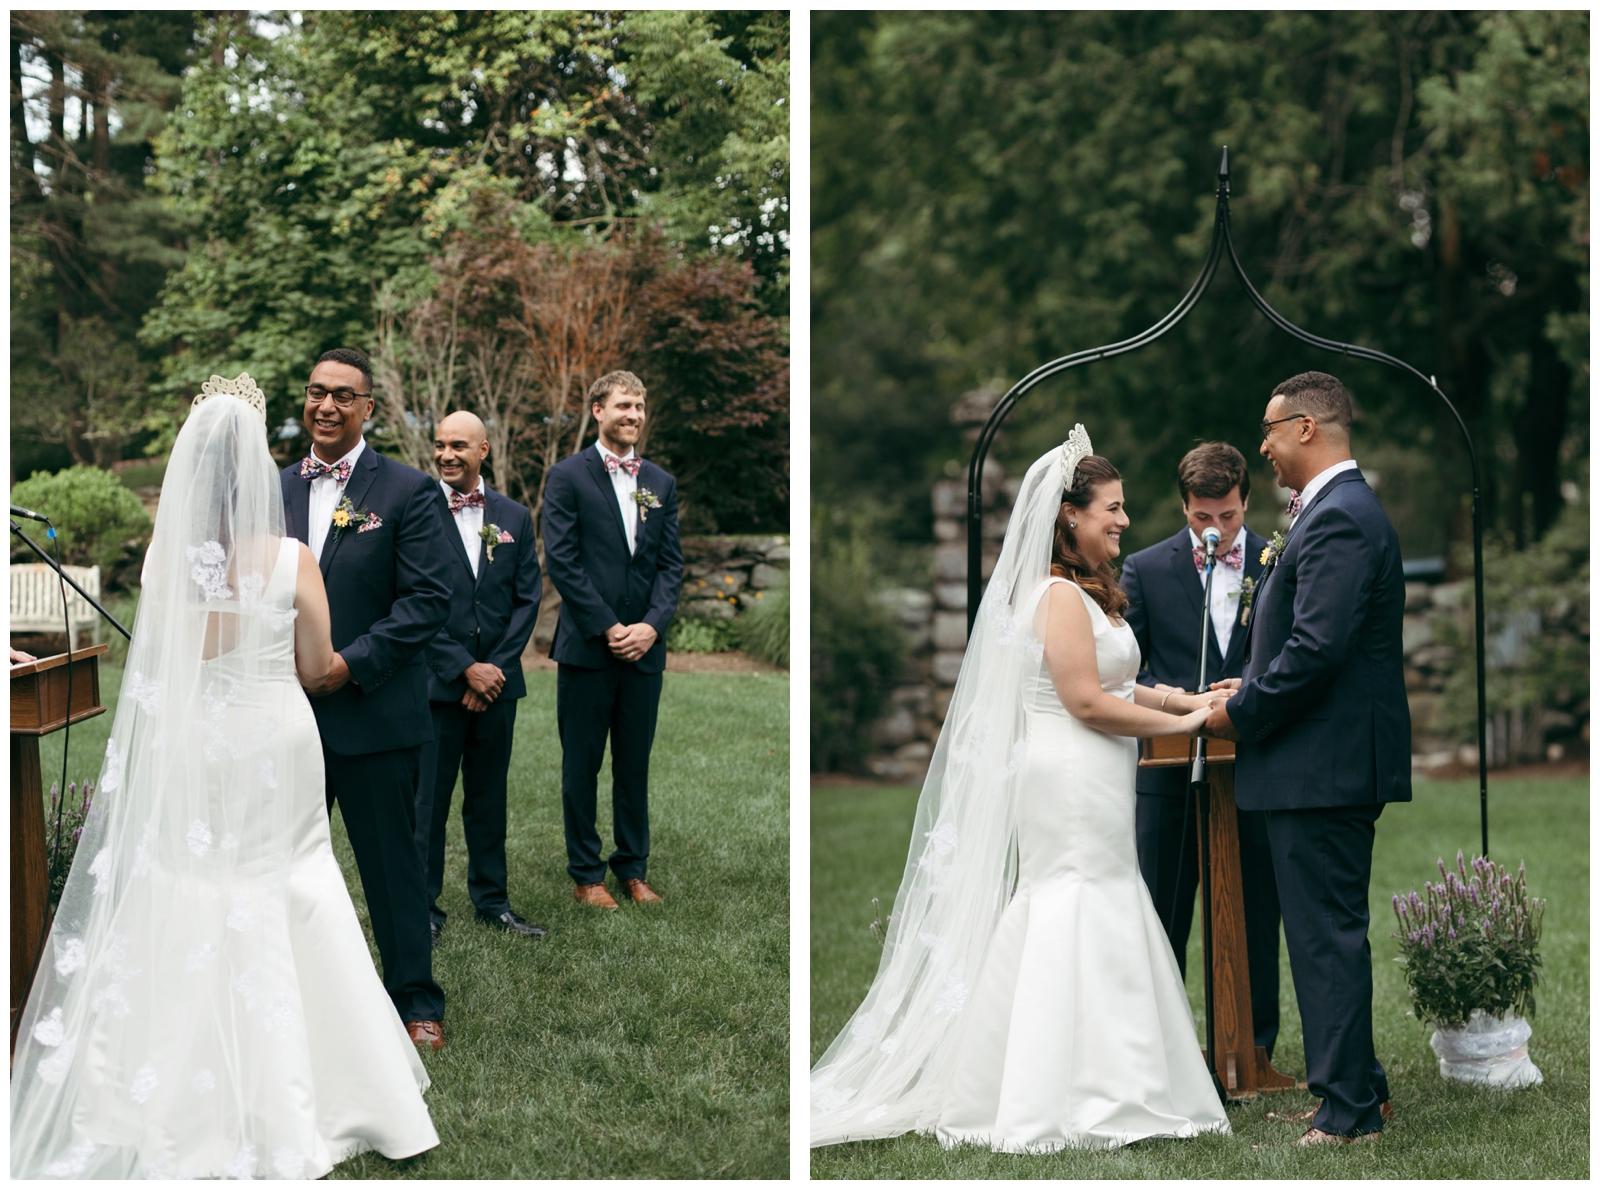 Bailey-Q-Photo-Connors-Center-Wedding-Boston-Wedding-Photographer-059.jpg